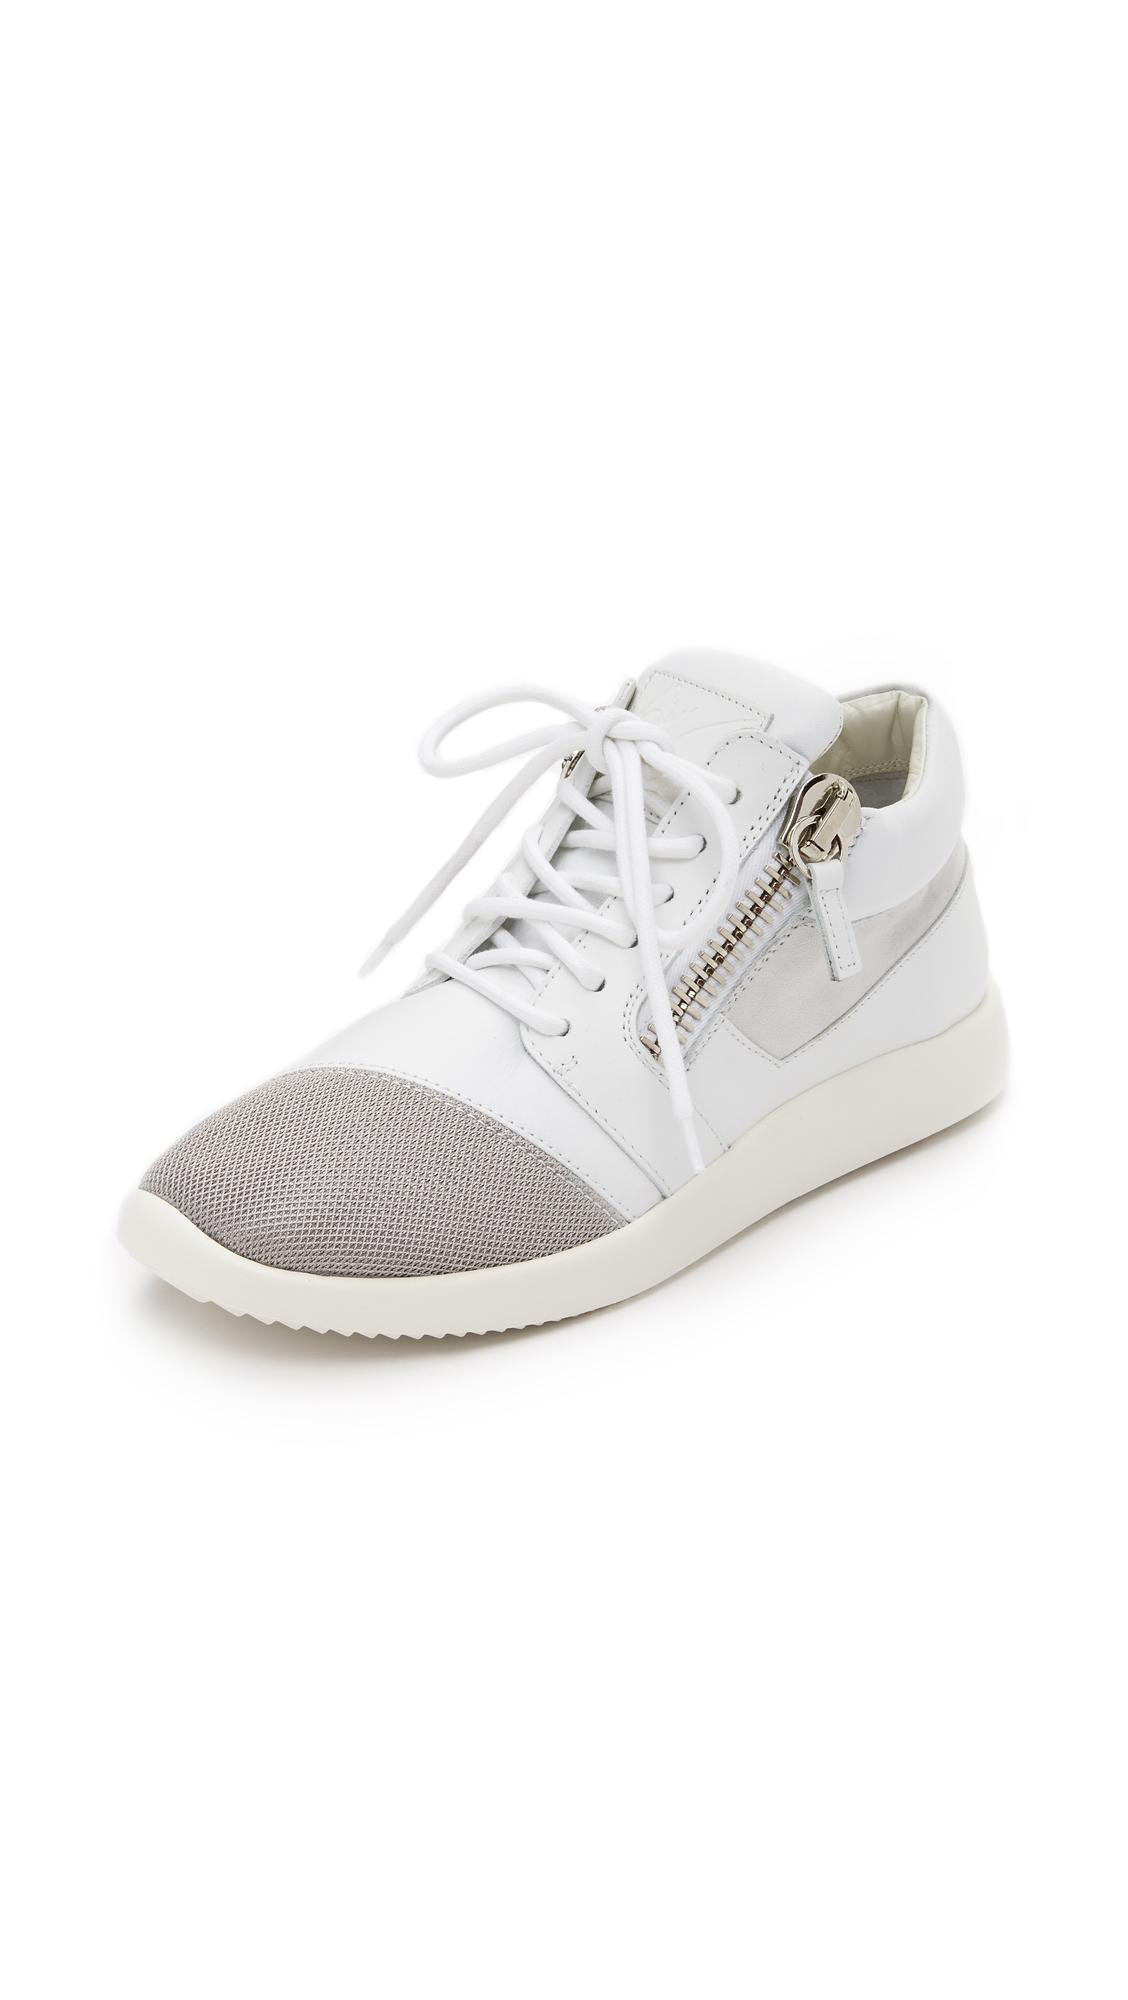 Giuseppe Zanotti Sneakers - White